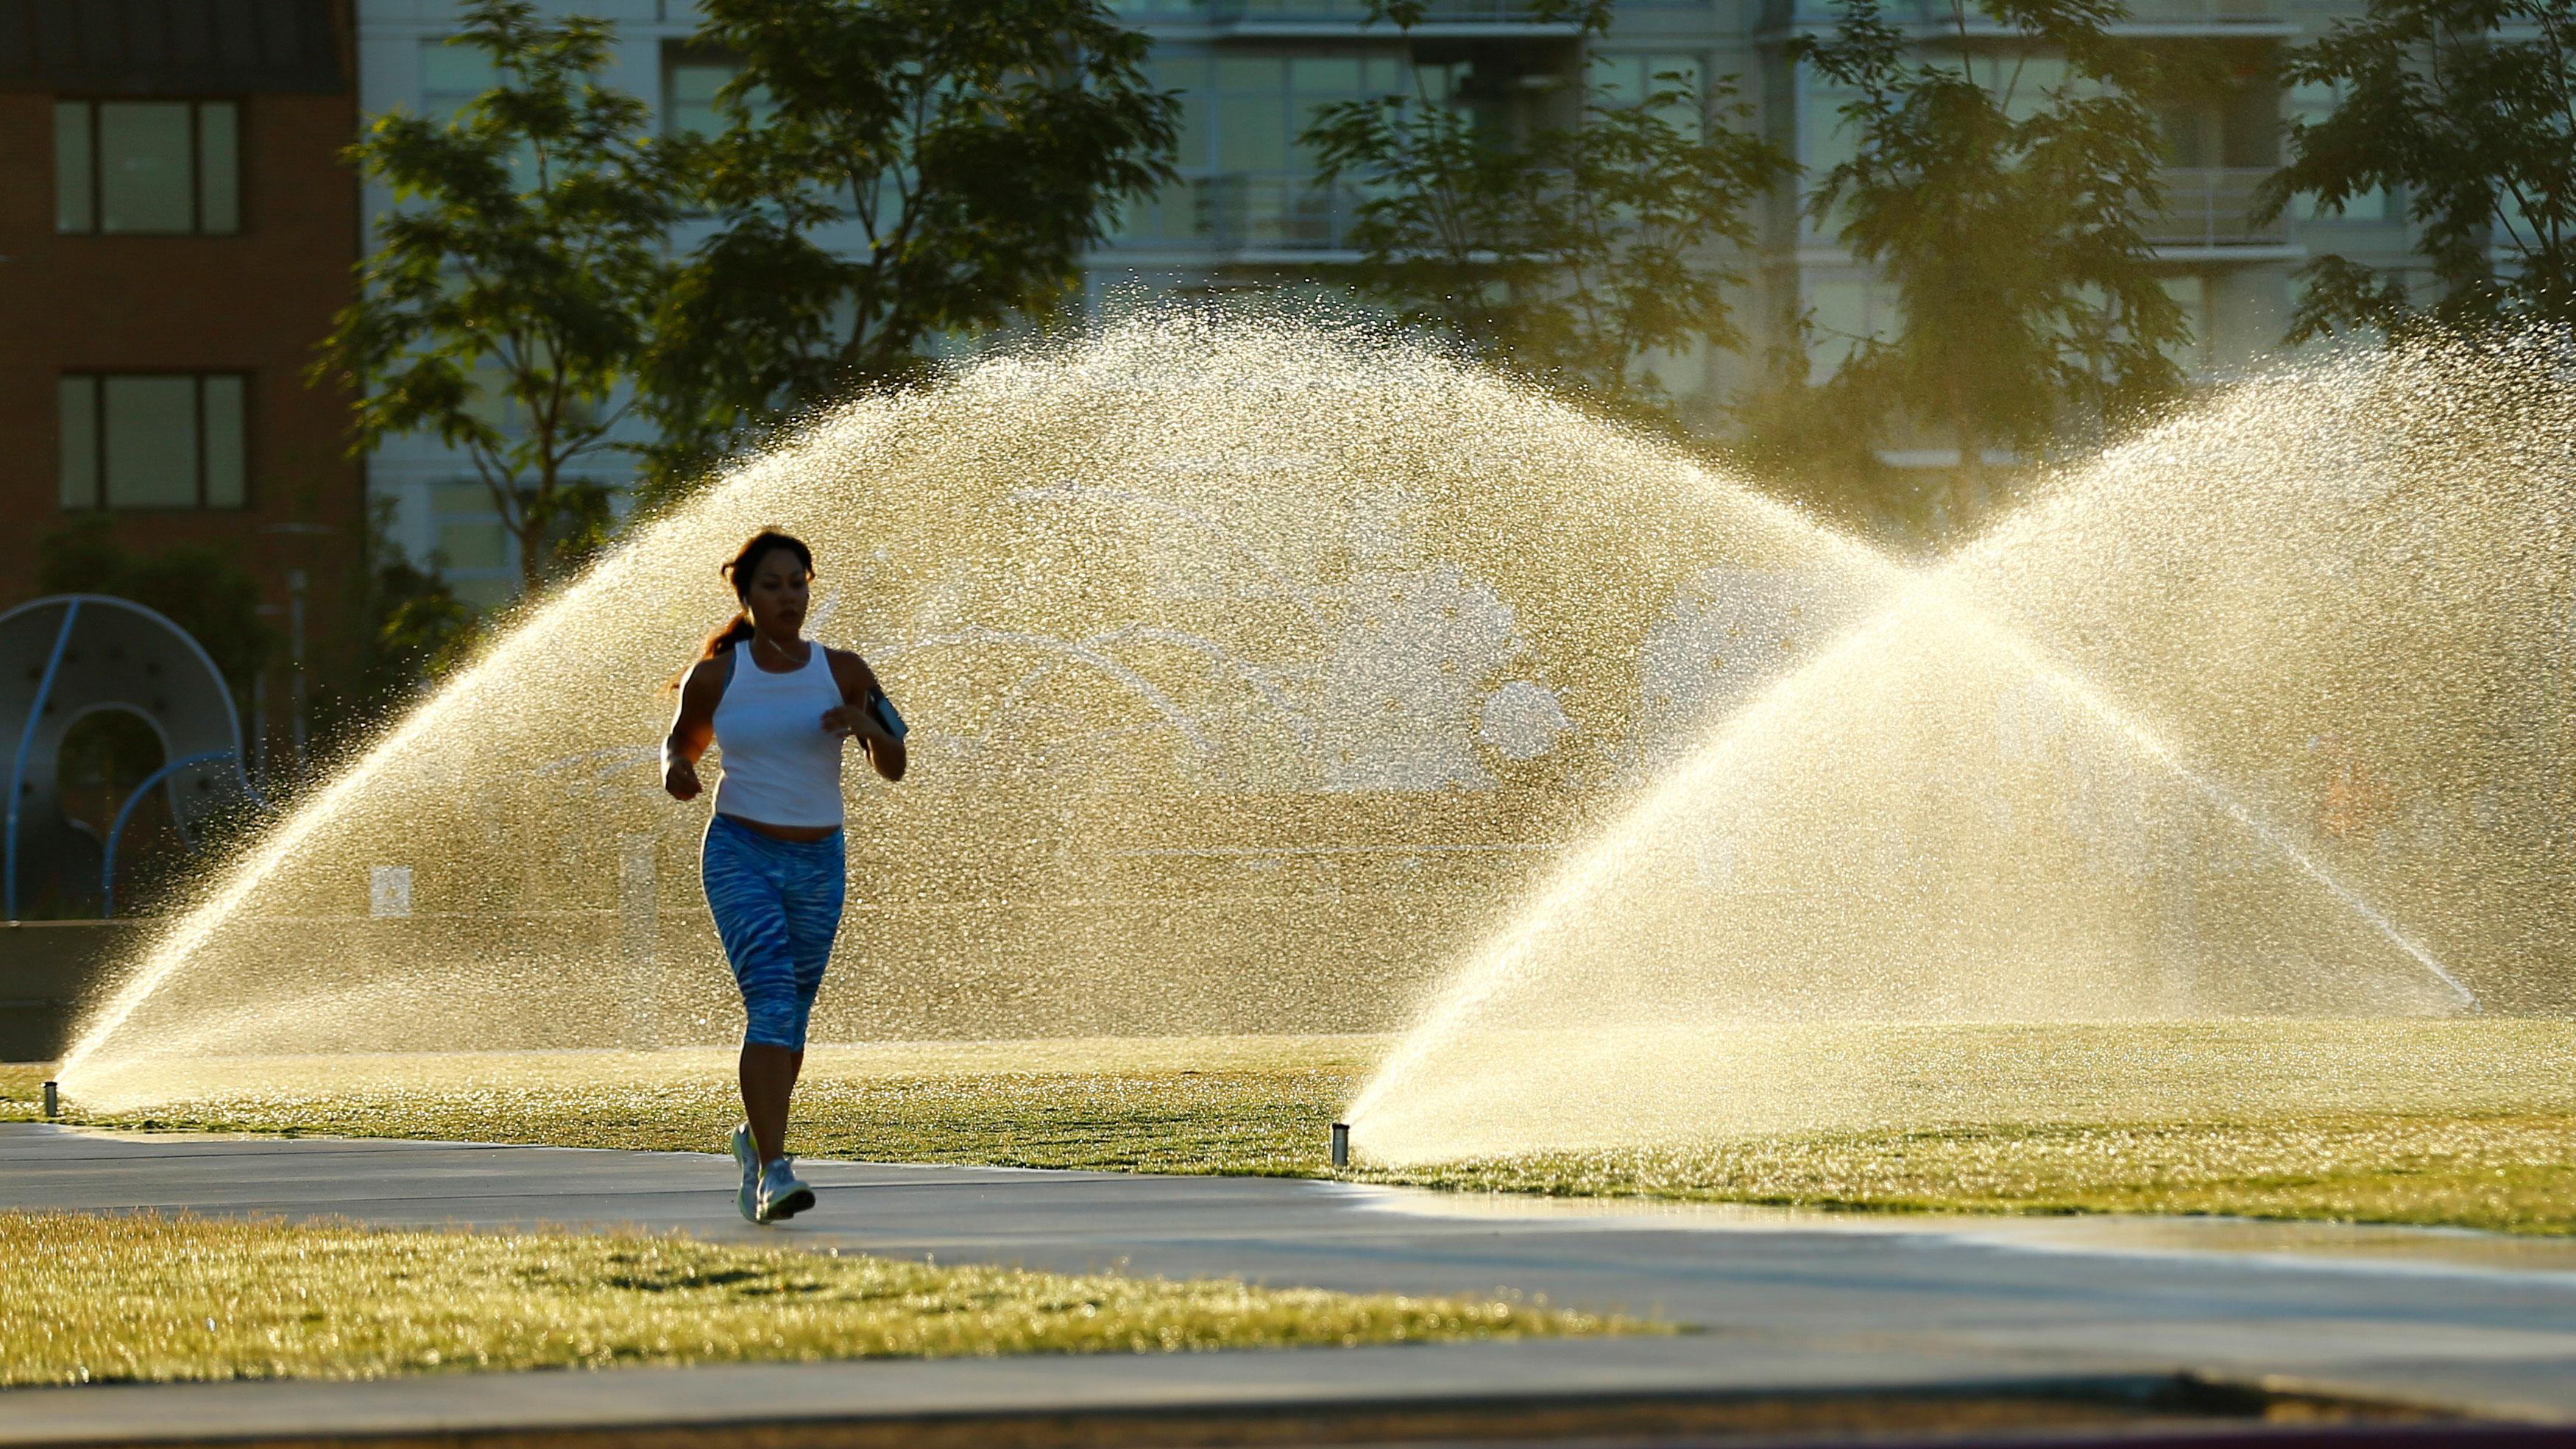 Sprinklers spray water onto grass as a jogger runs through a city park in San Diego, California